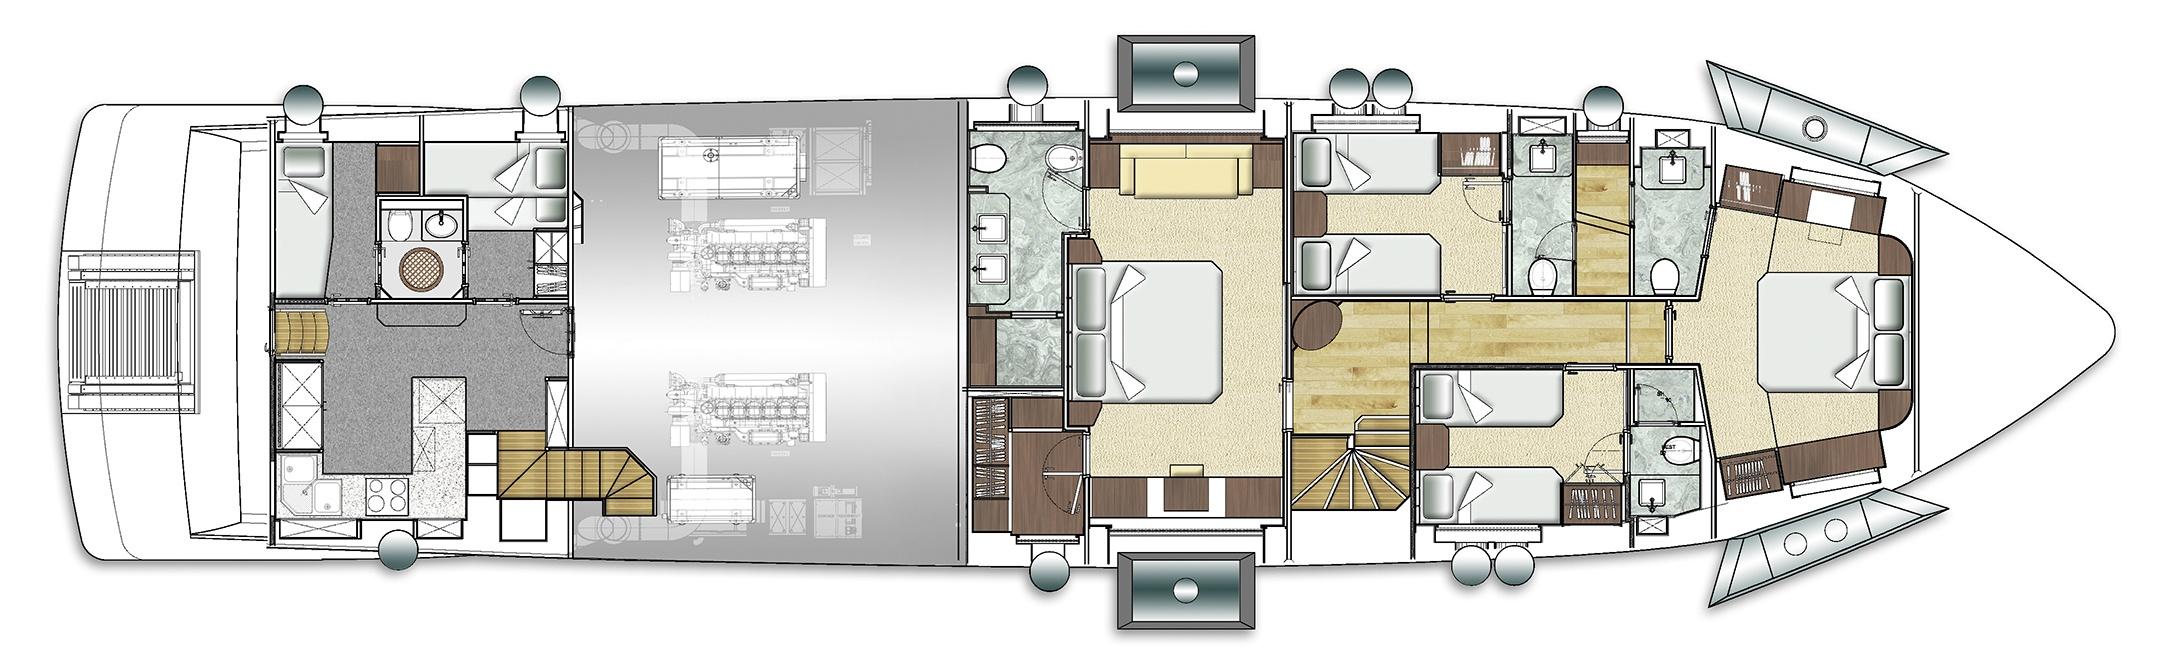 majesty-90-lower-deck.jpg